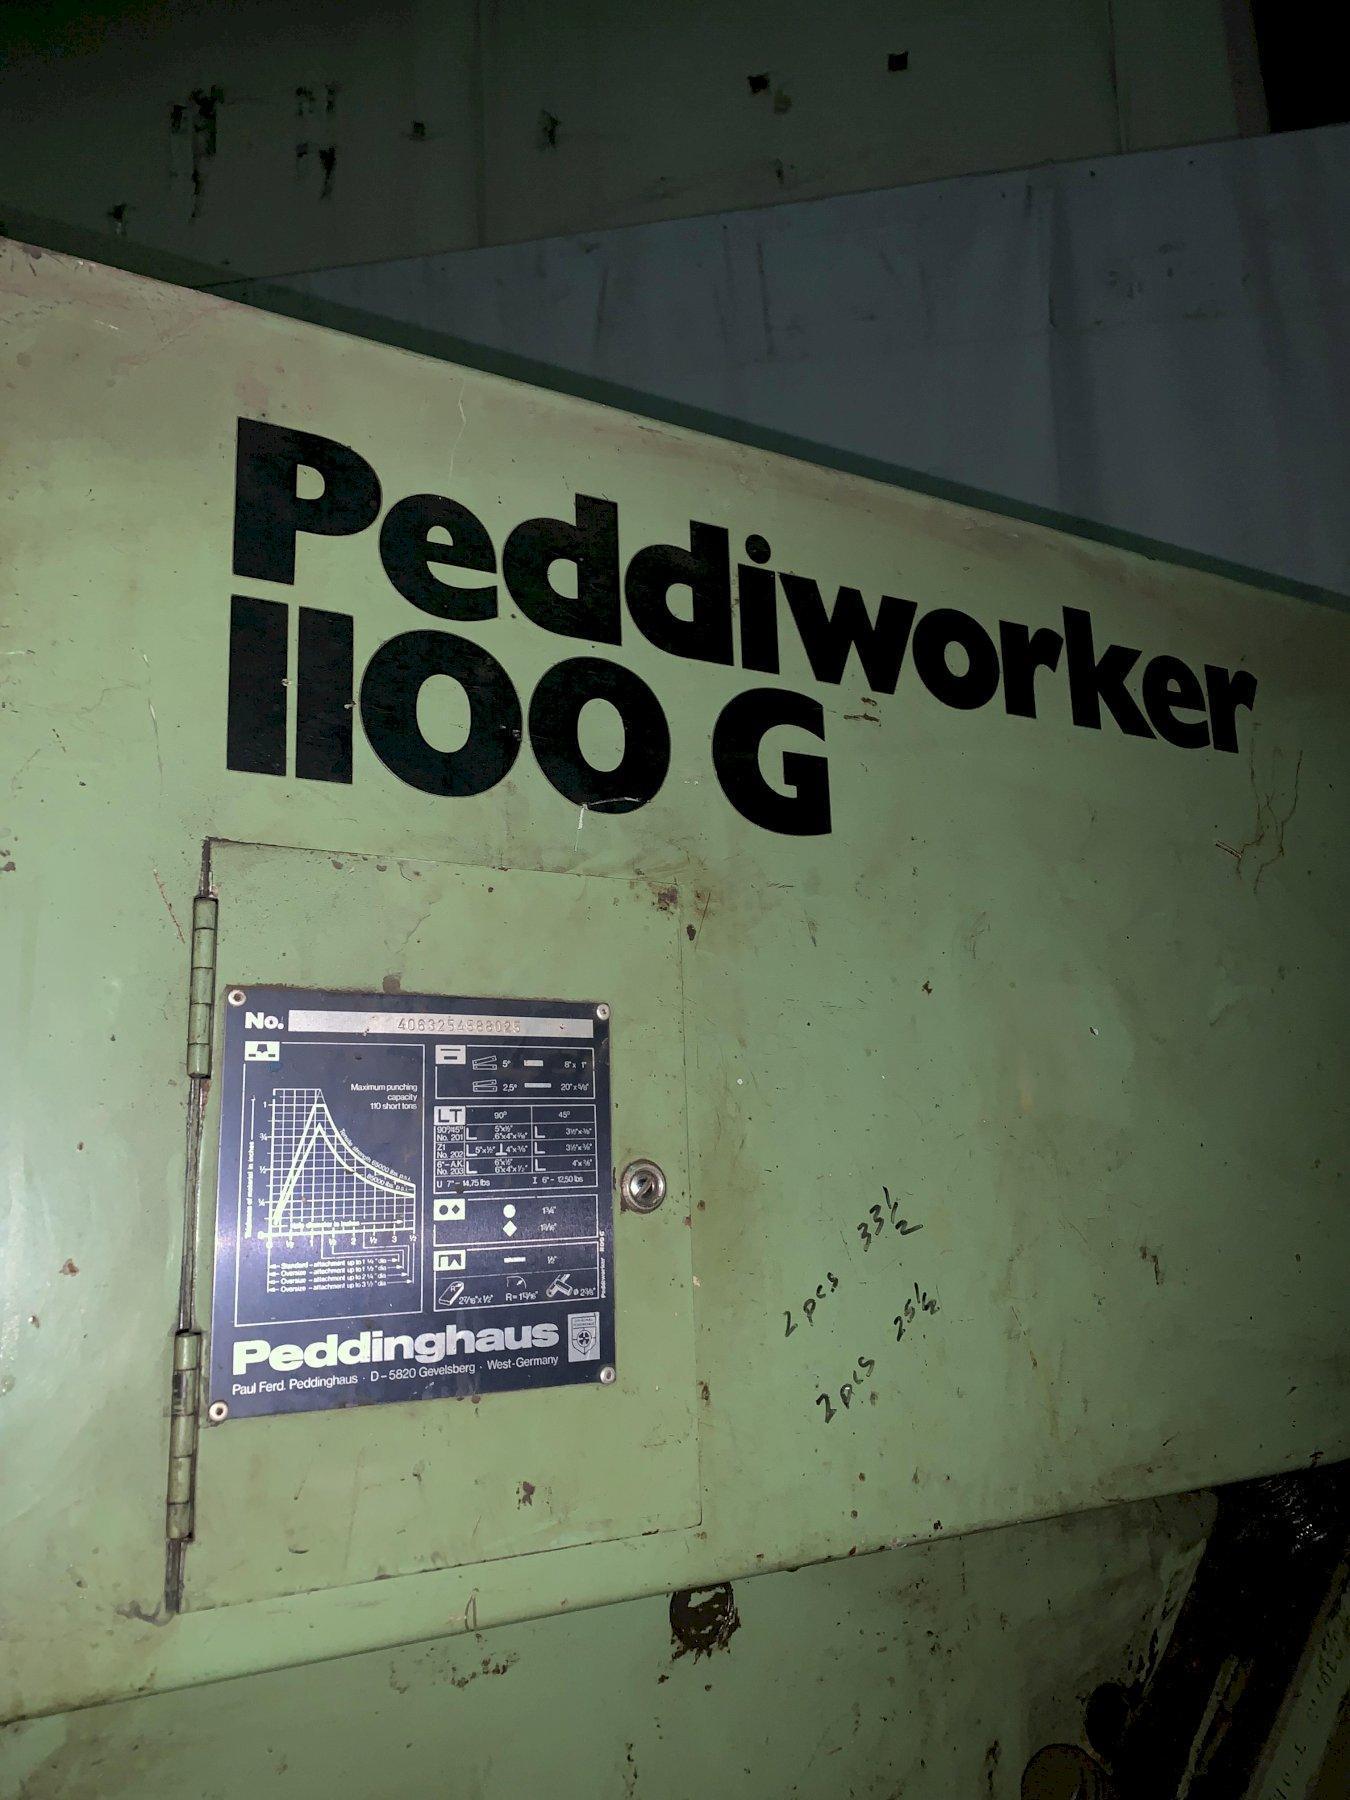 "110 TON PEDDINGHAUS ""PEDDIWORKER"" 1100G HYDRAULIC IRONWORKER: STOCK #11811"